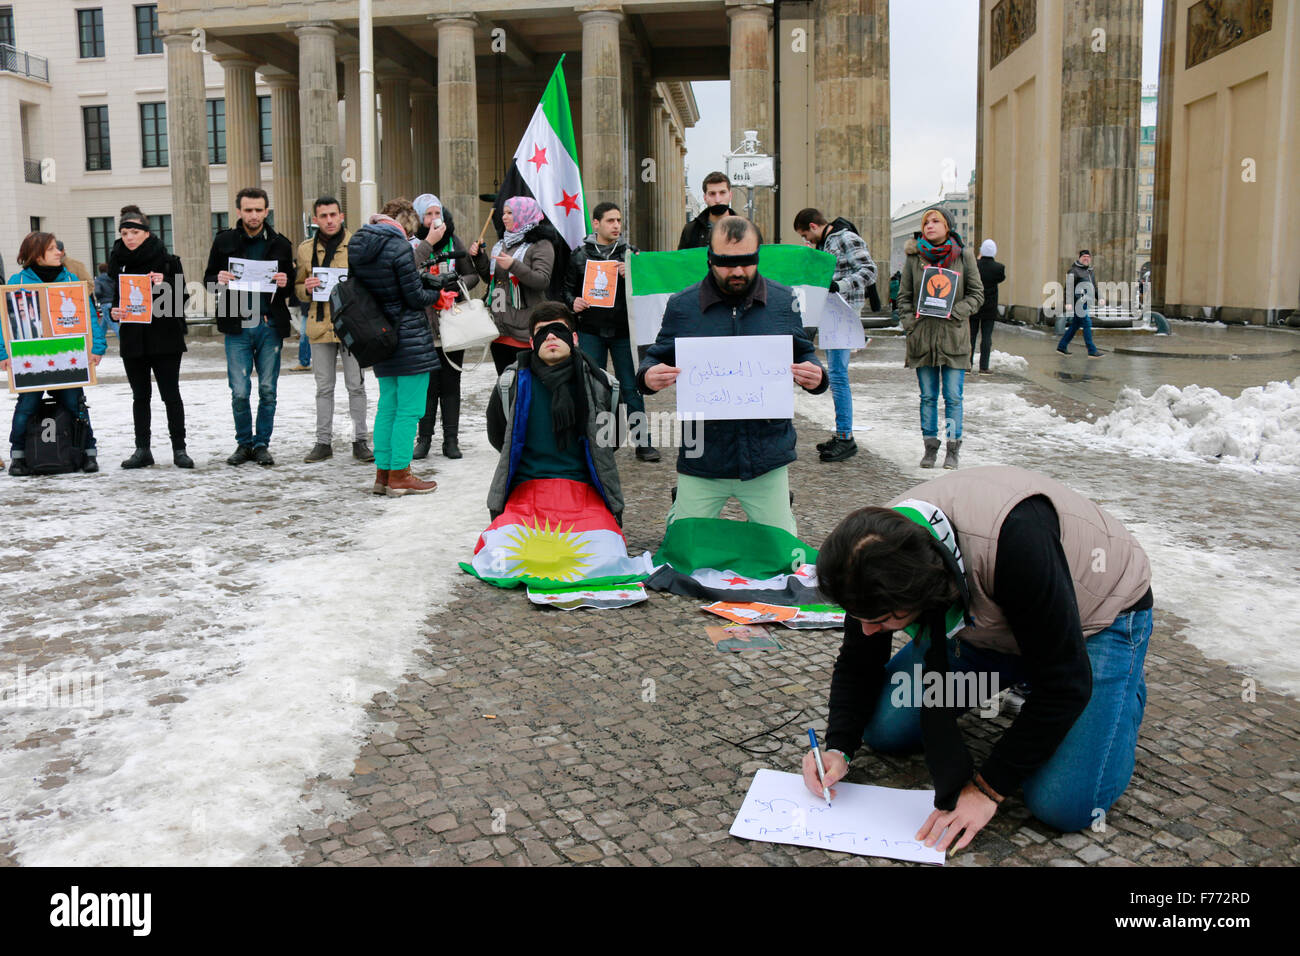 Proteste syrischer Exilanten vor dem Brandenburger Tor, Berlin. - Stock Image